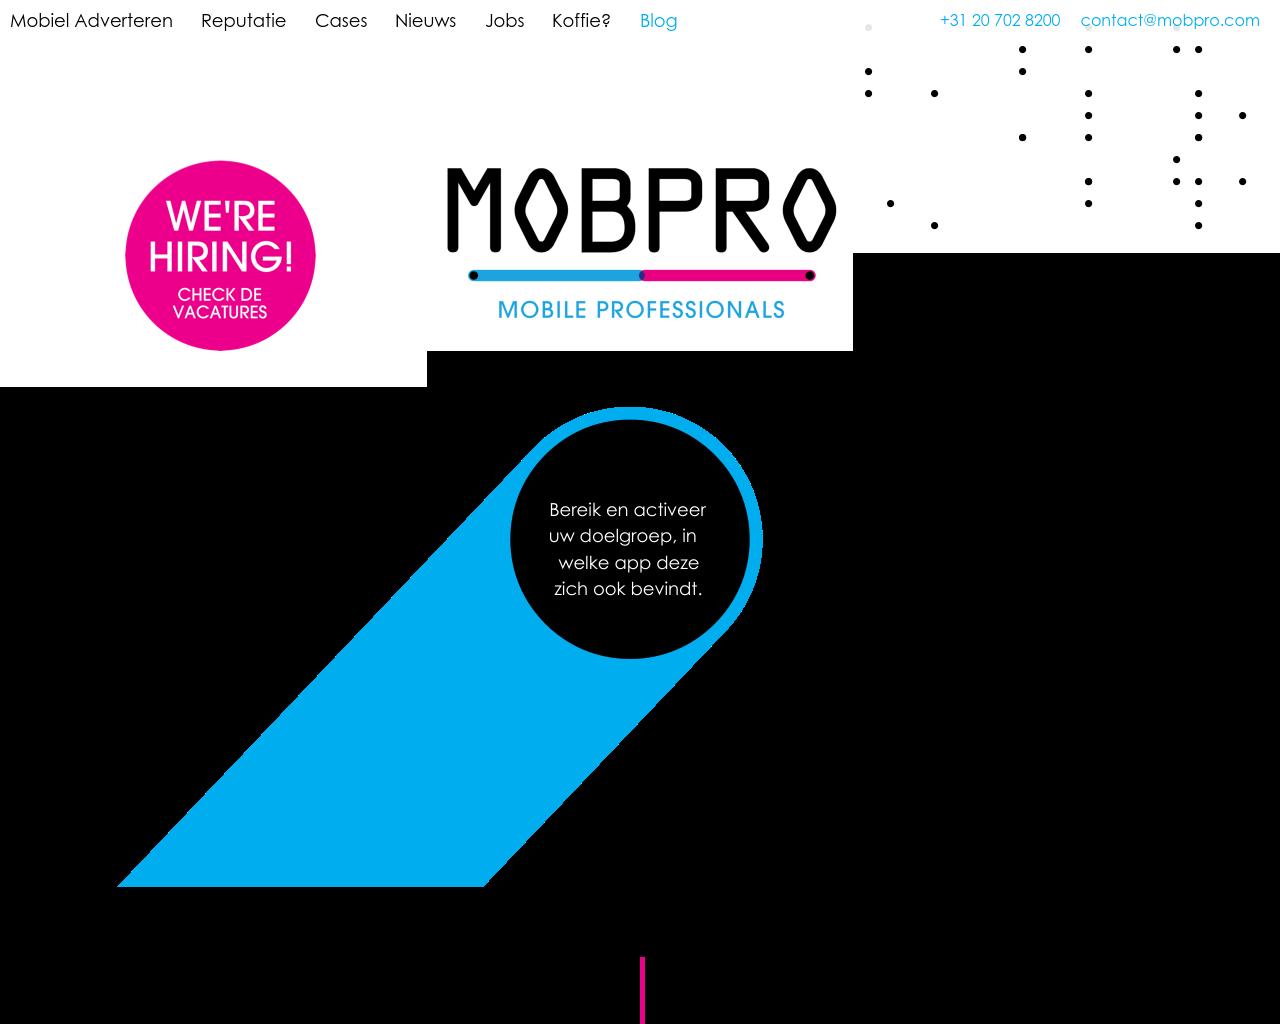 MobPro-Advertising-Reviews-Pricing